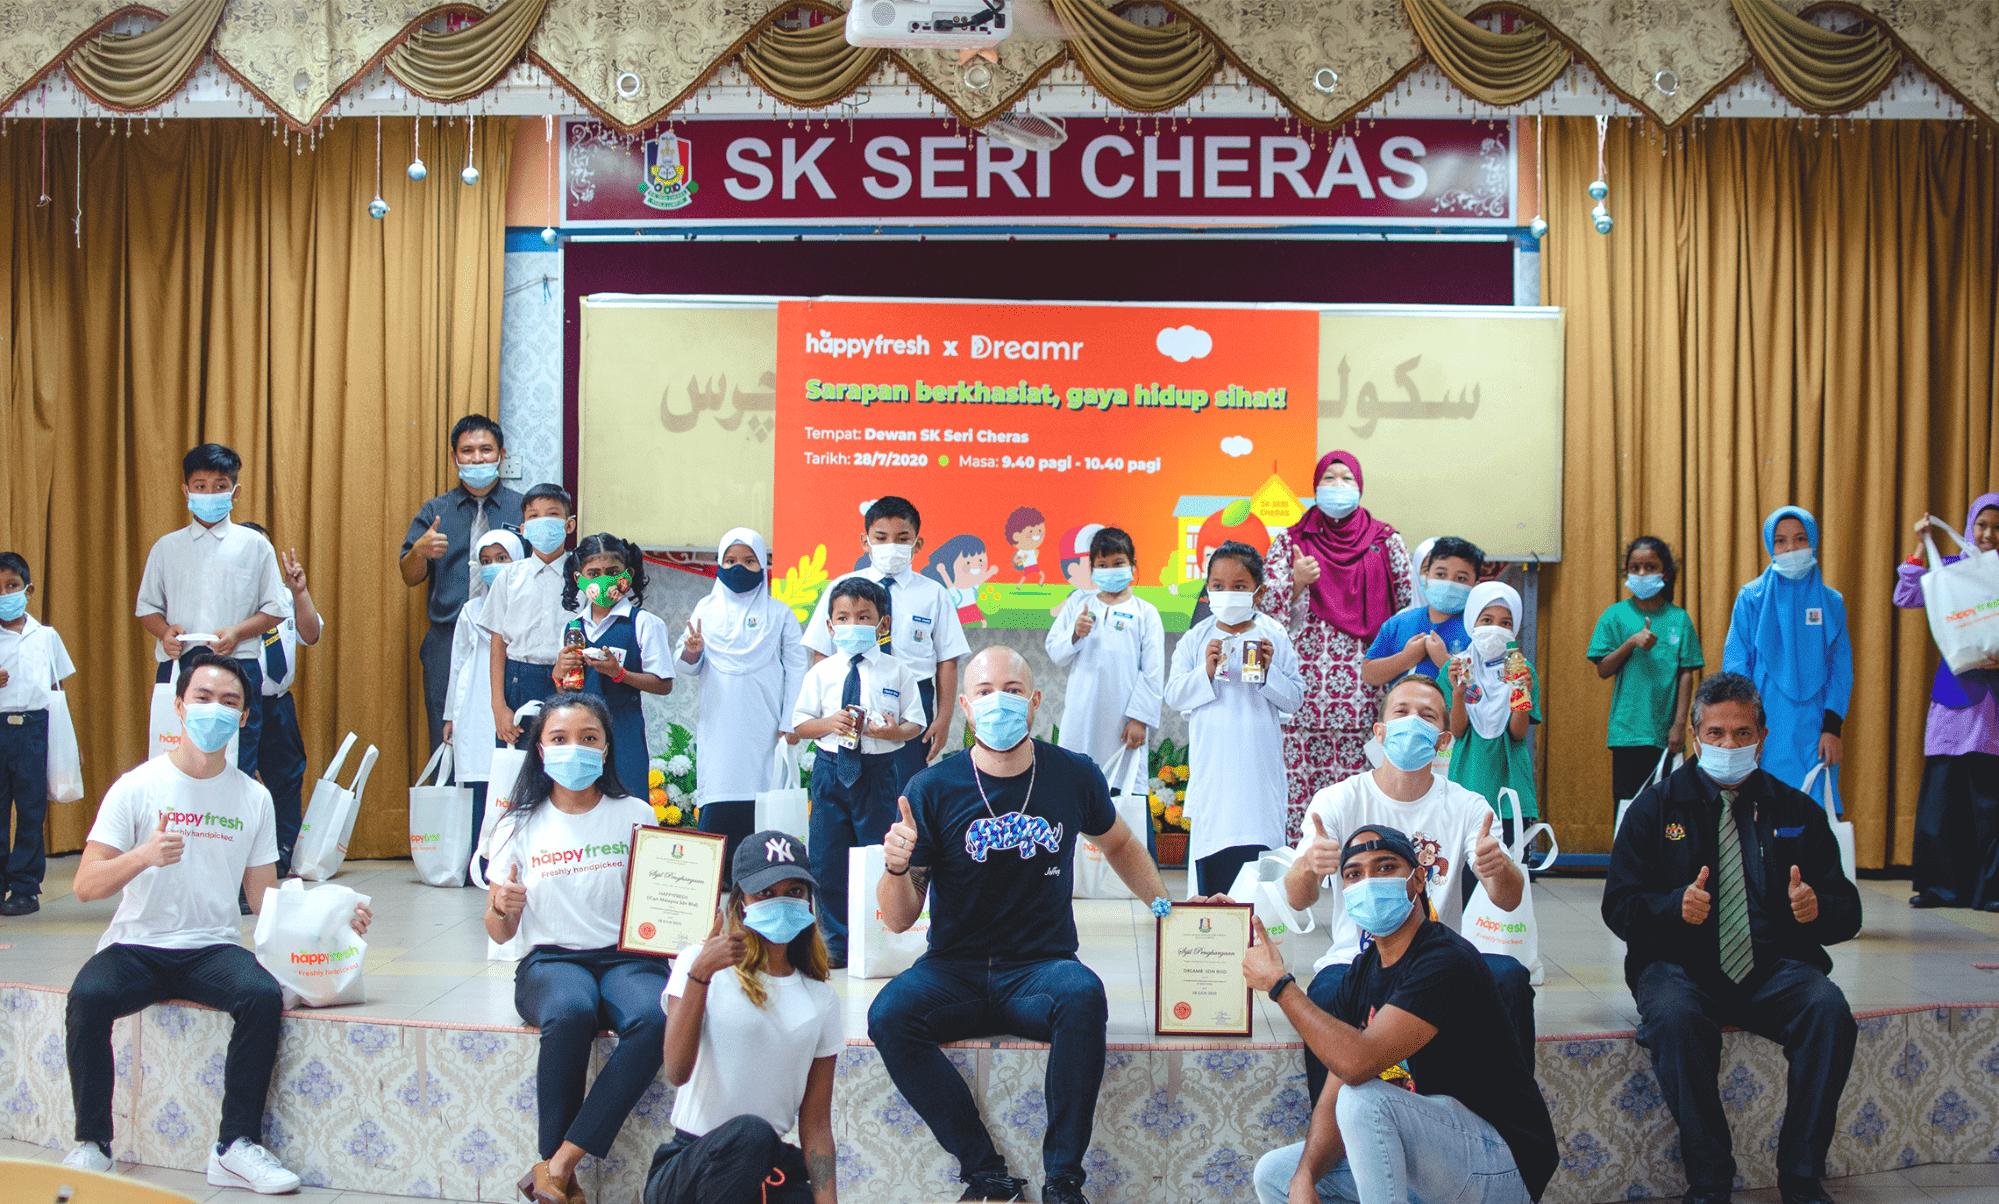 HappyFresh and Dreamr visit SK Sri Cheras